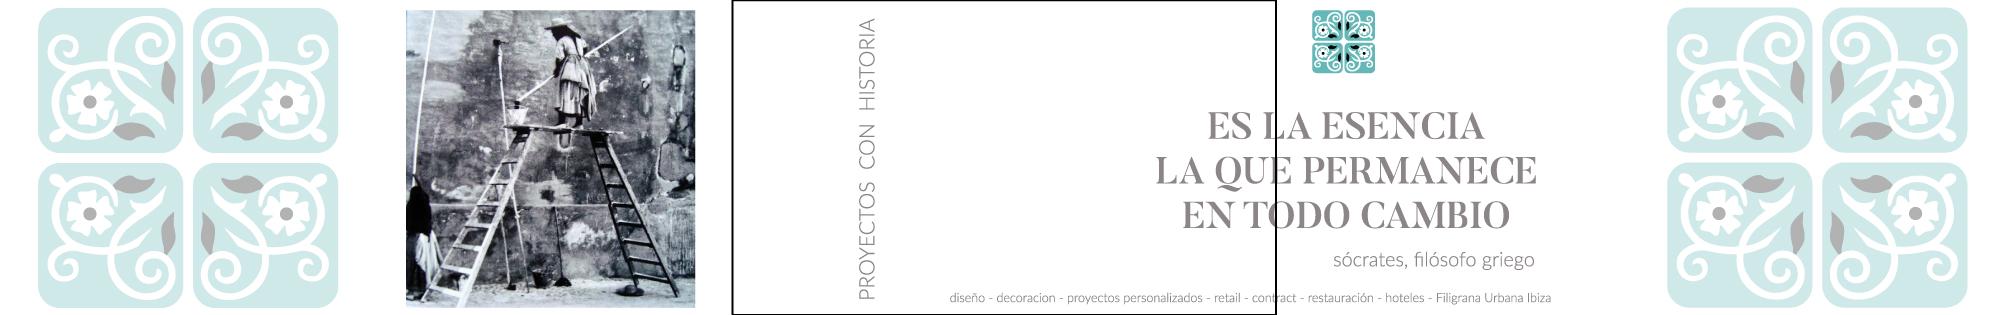 PLANTILLA-CABECERA-PROYECTO-RECTANGULAR-MARCO - Filigrana Urbana